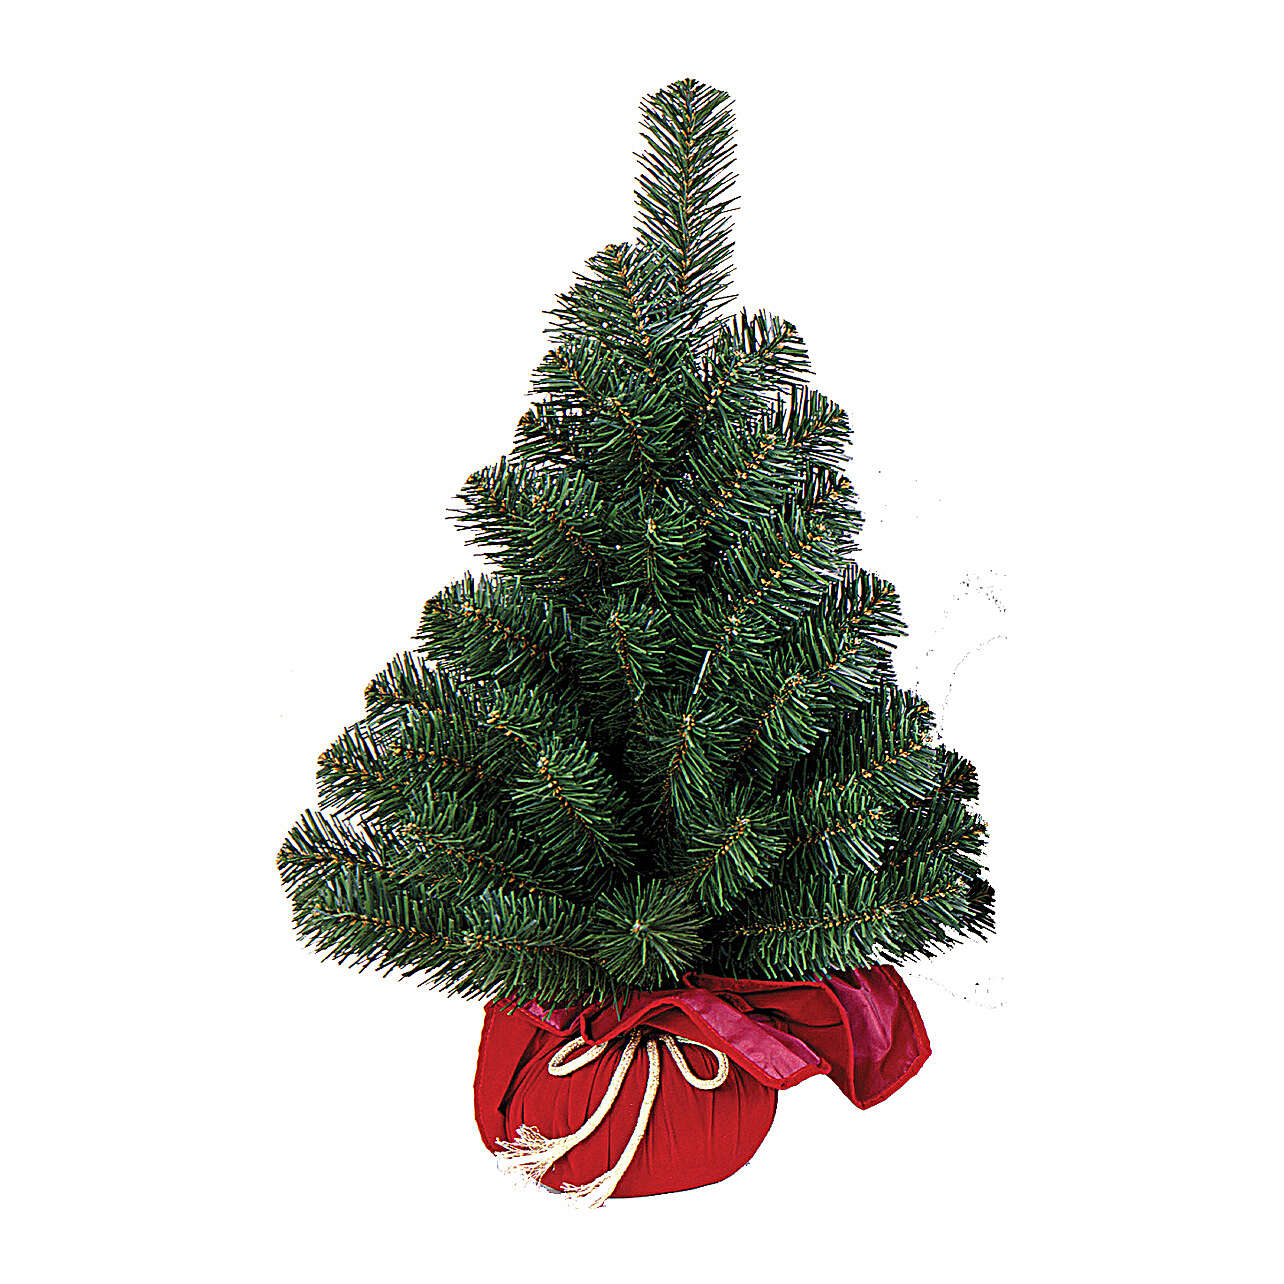 Árvore de Natal pequena 90 cm iluminada Noble Spruce Tree Slim base vermelha 3